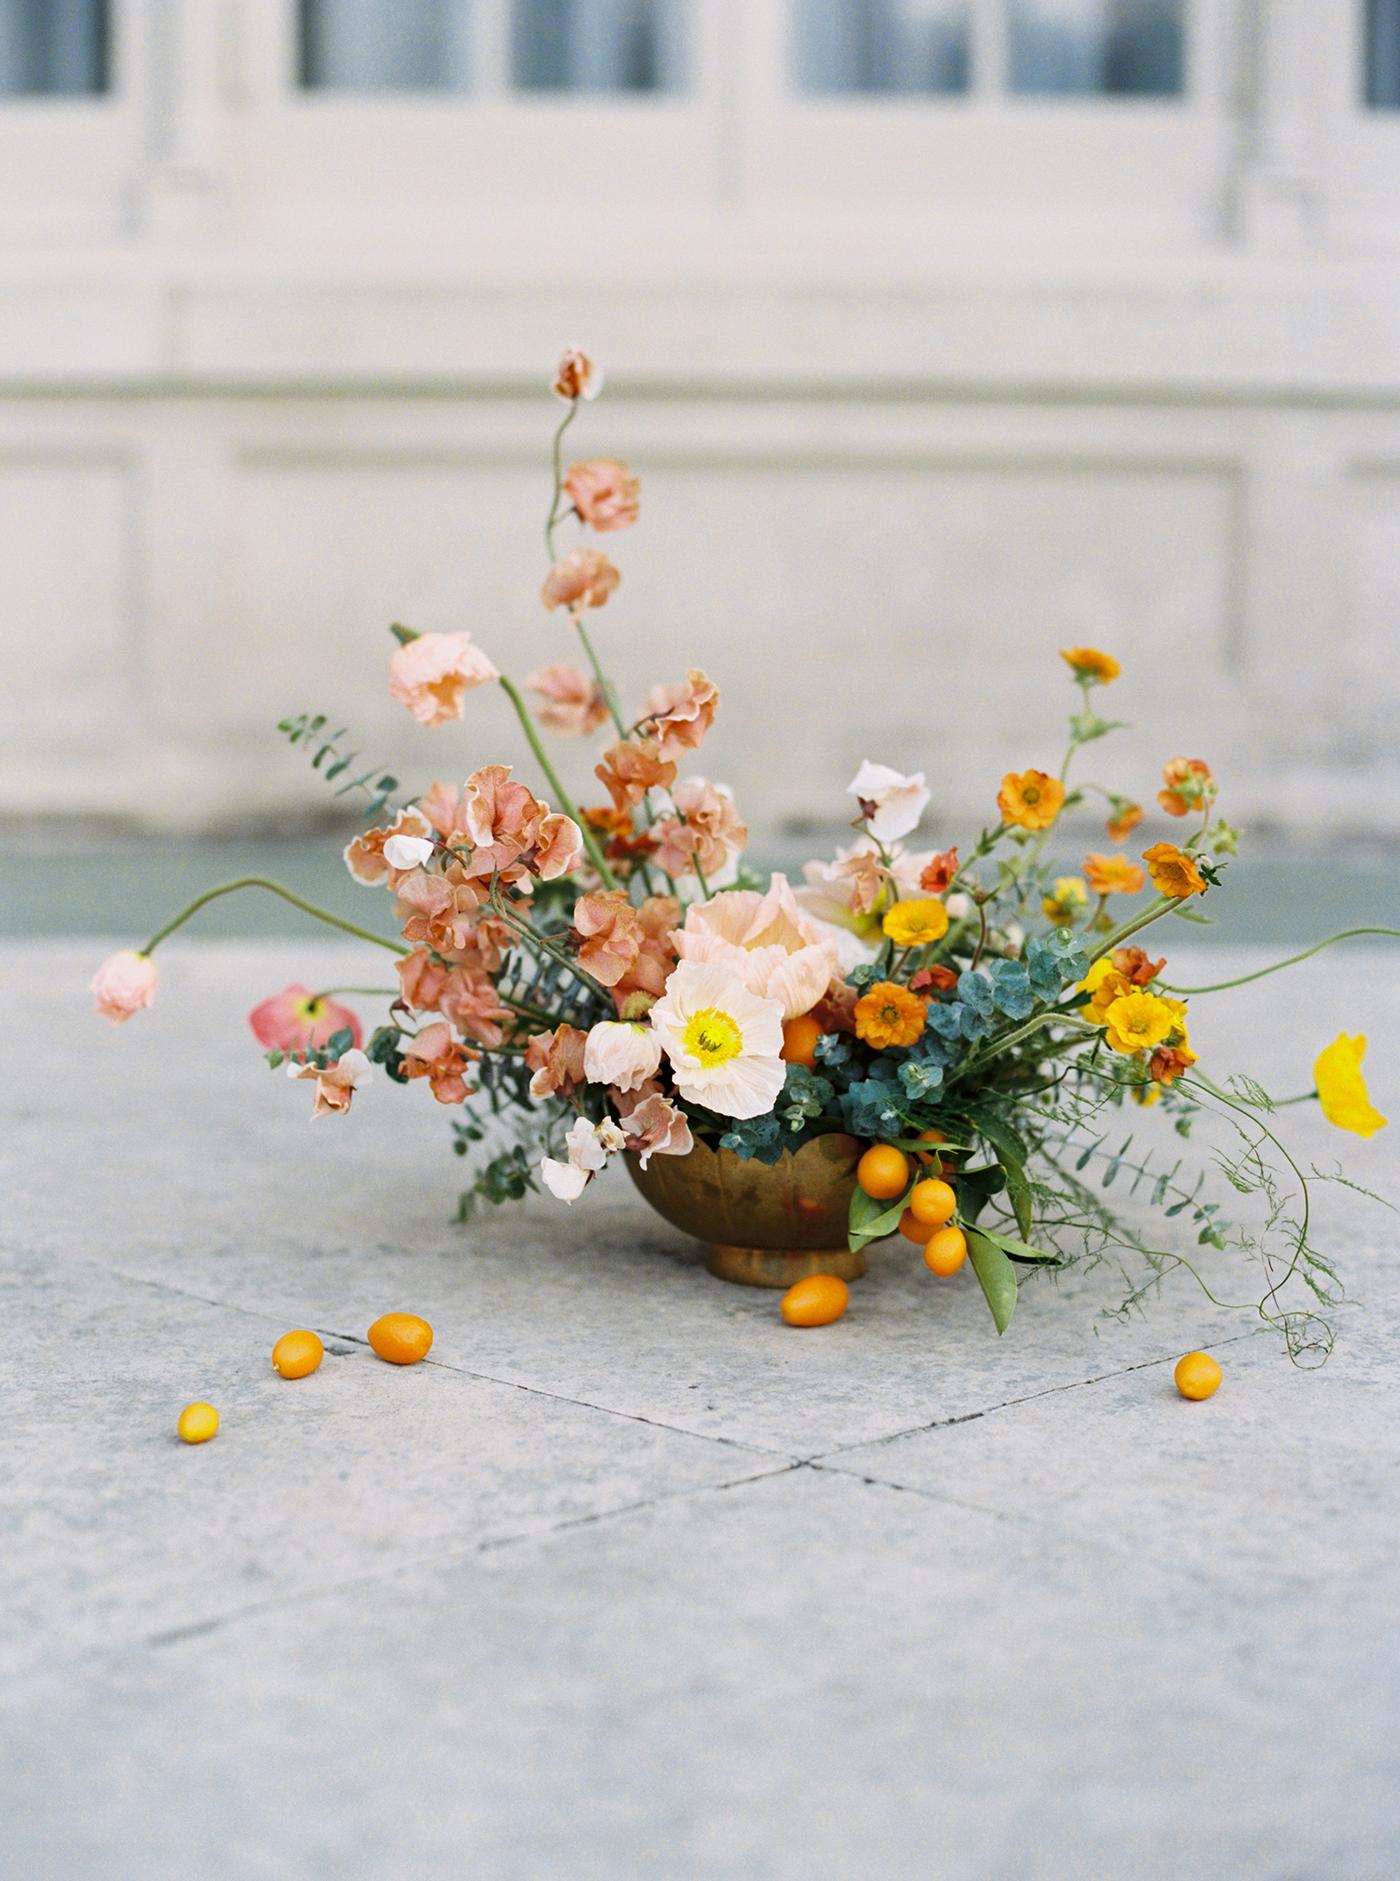 Fine Art Wedding Florist - Dallas, Texas - Olive Grove Design - 00069.jpg